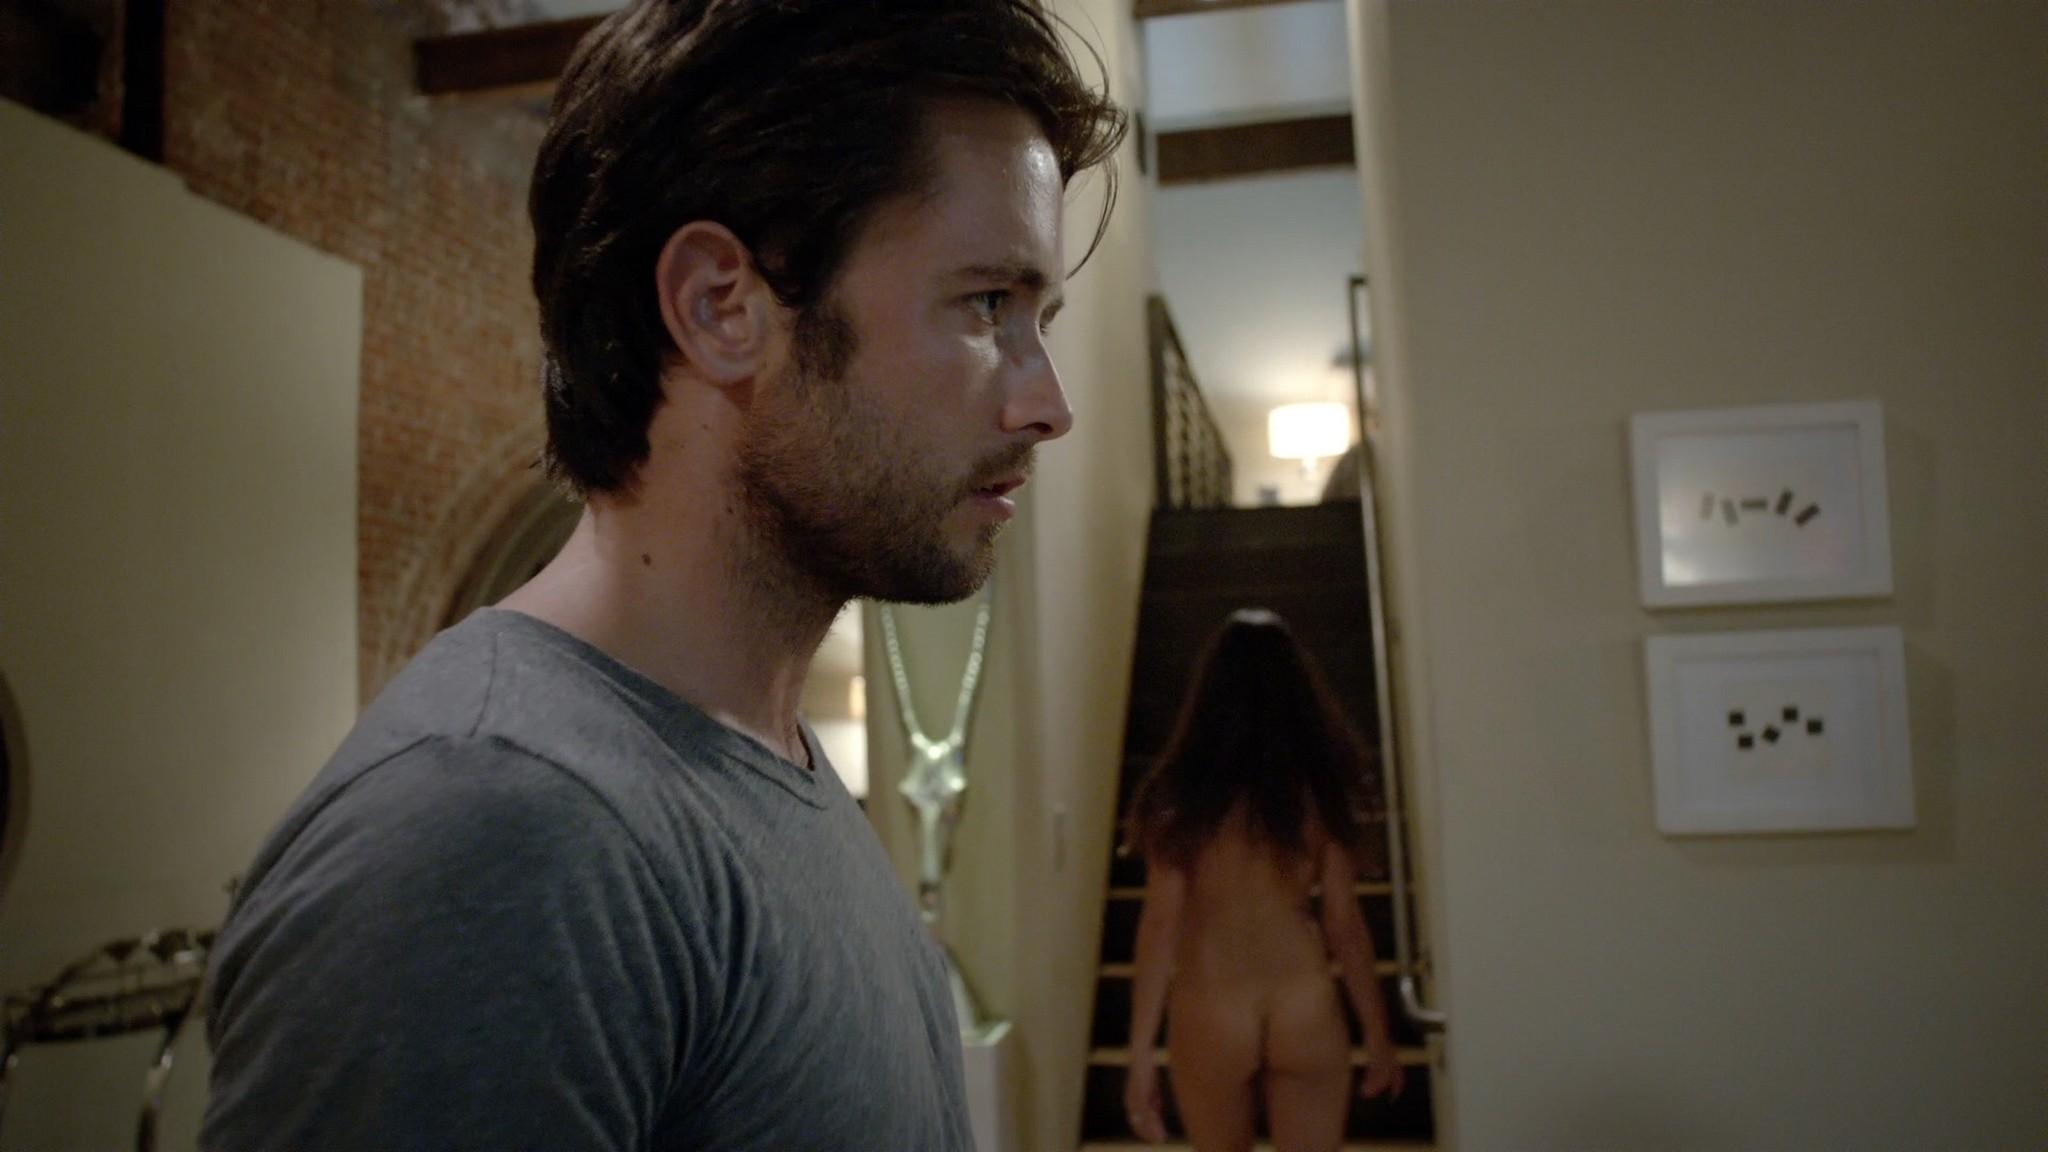 Stephanie Fantauzzi butt naked and topless - Shameless s3e7 (2013) HD 1080p (2)